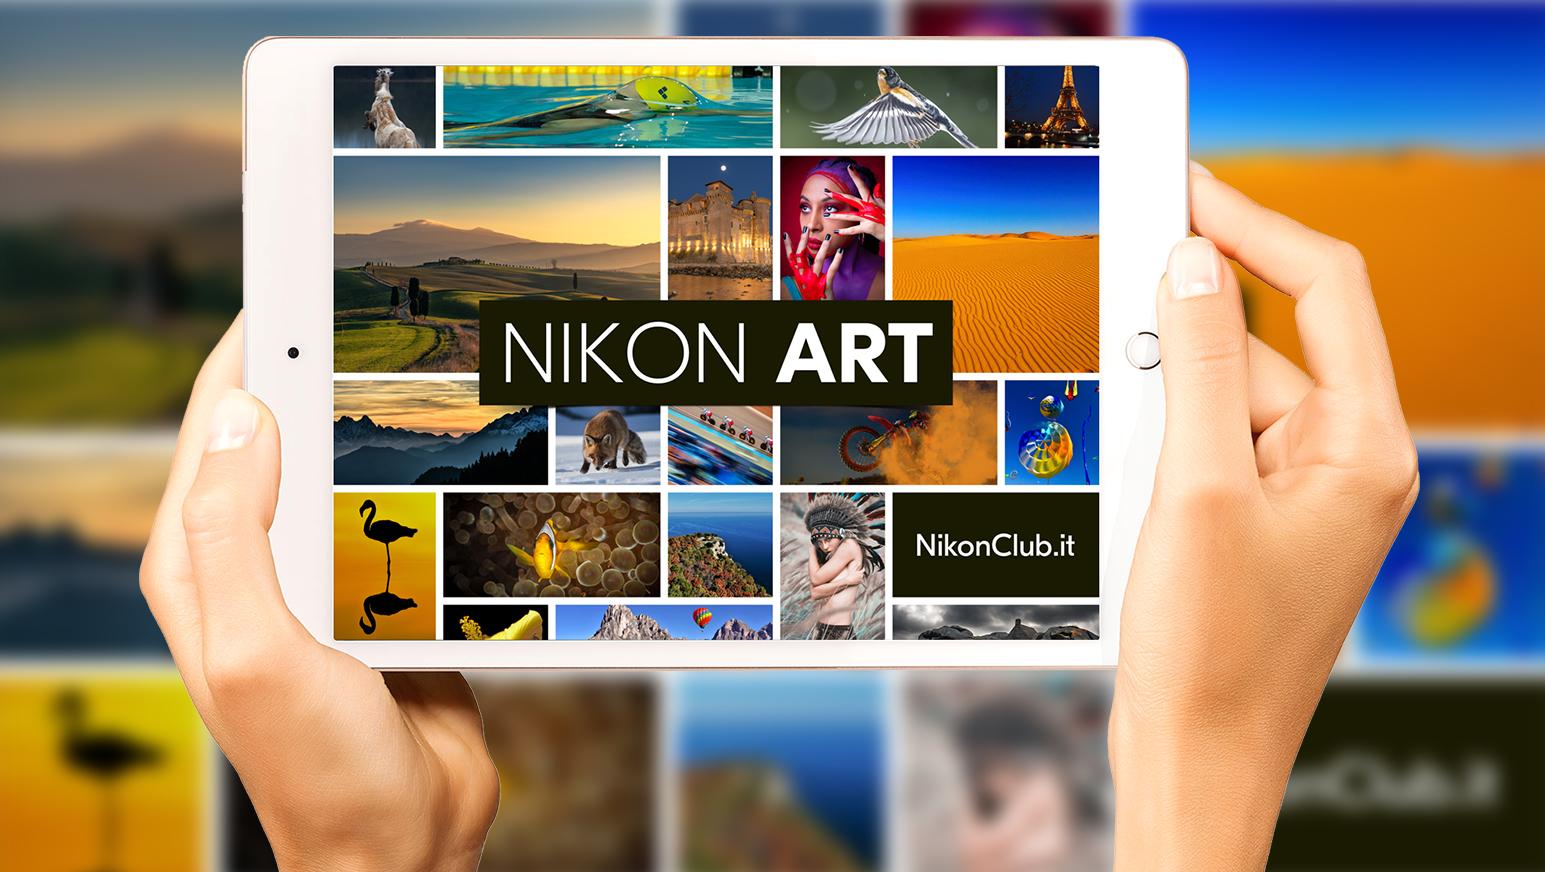 Nikon Art Gallery